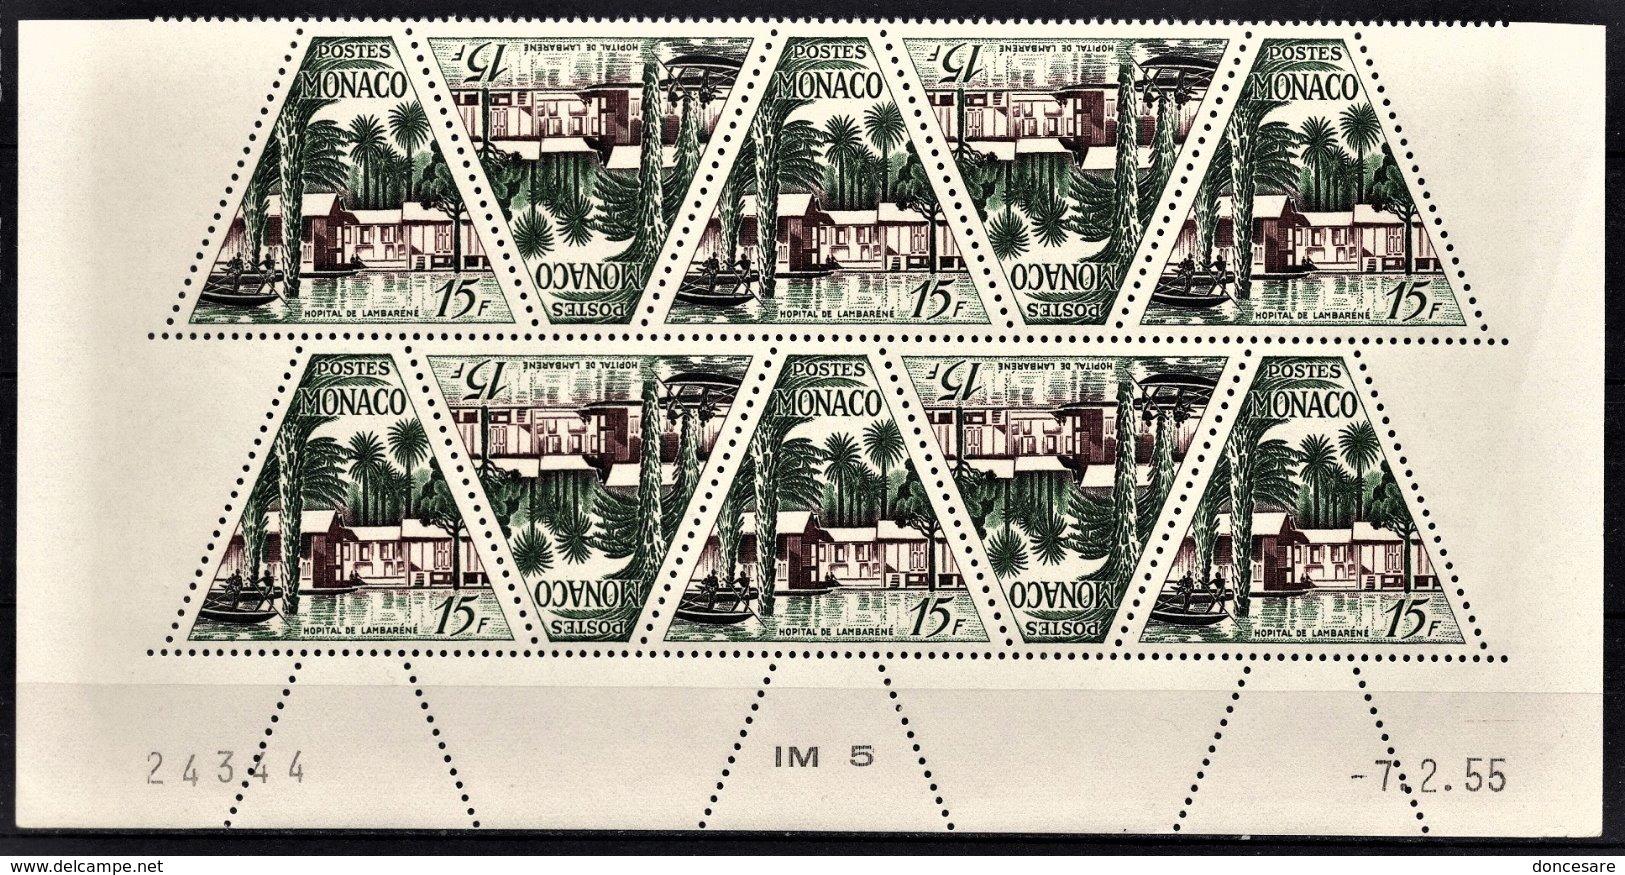 MONACO 1955 - BLOC DE 10 TP / N° 414- NEUFS ** COIN DE FEUILLE / DATE - Monaco